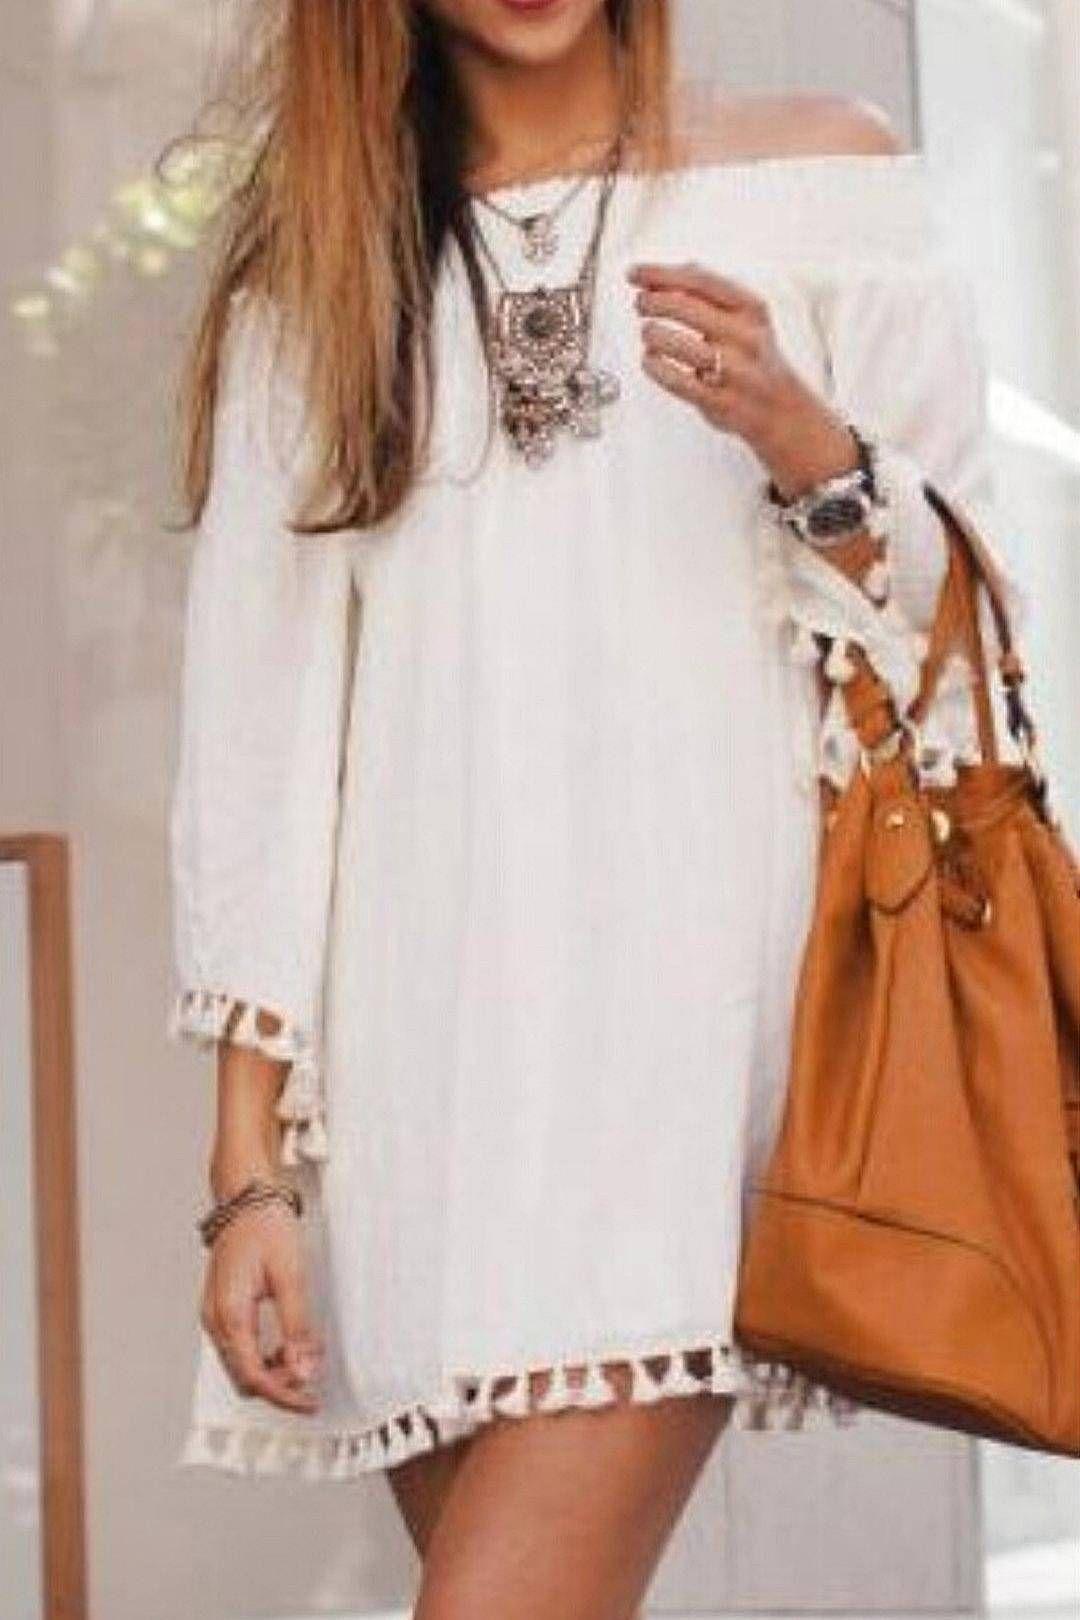 77acf6d11c34 White Off Shoulder Mini Dress with Tassel Detail  white  cute  women  summer   dress  outerwear  streetstyle